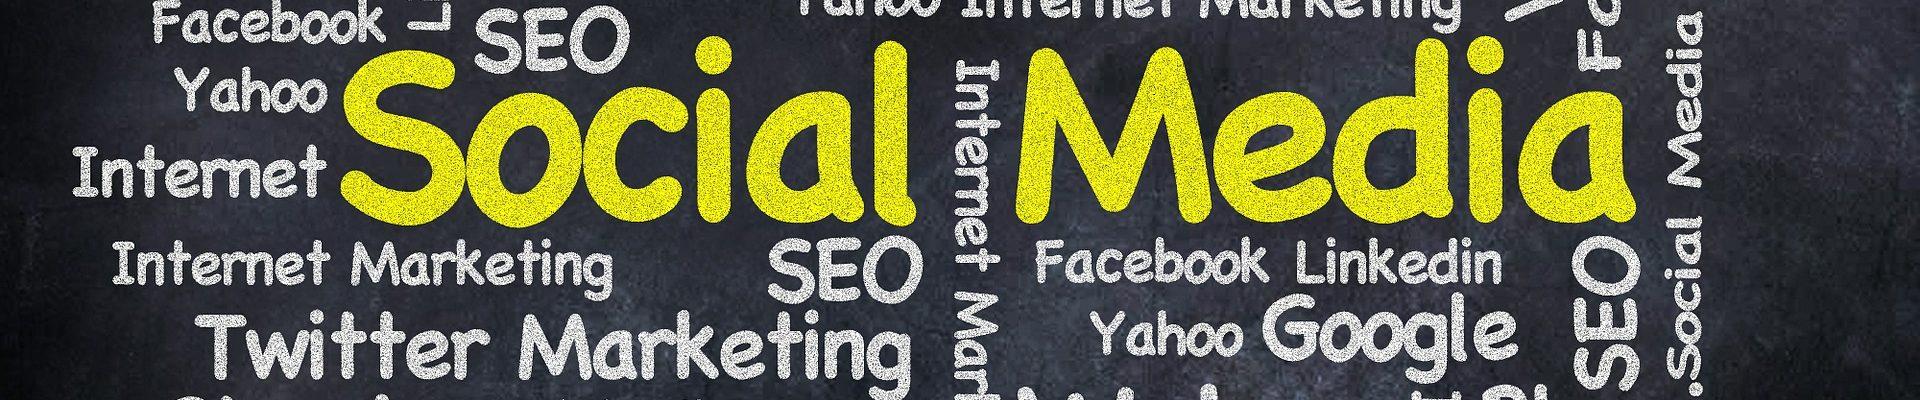 sociale-medier